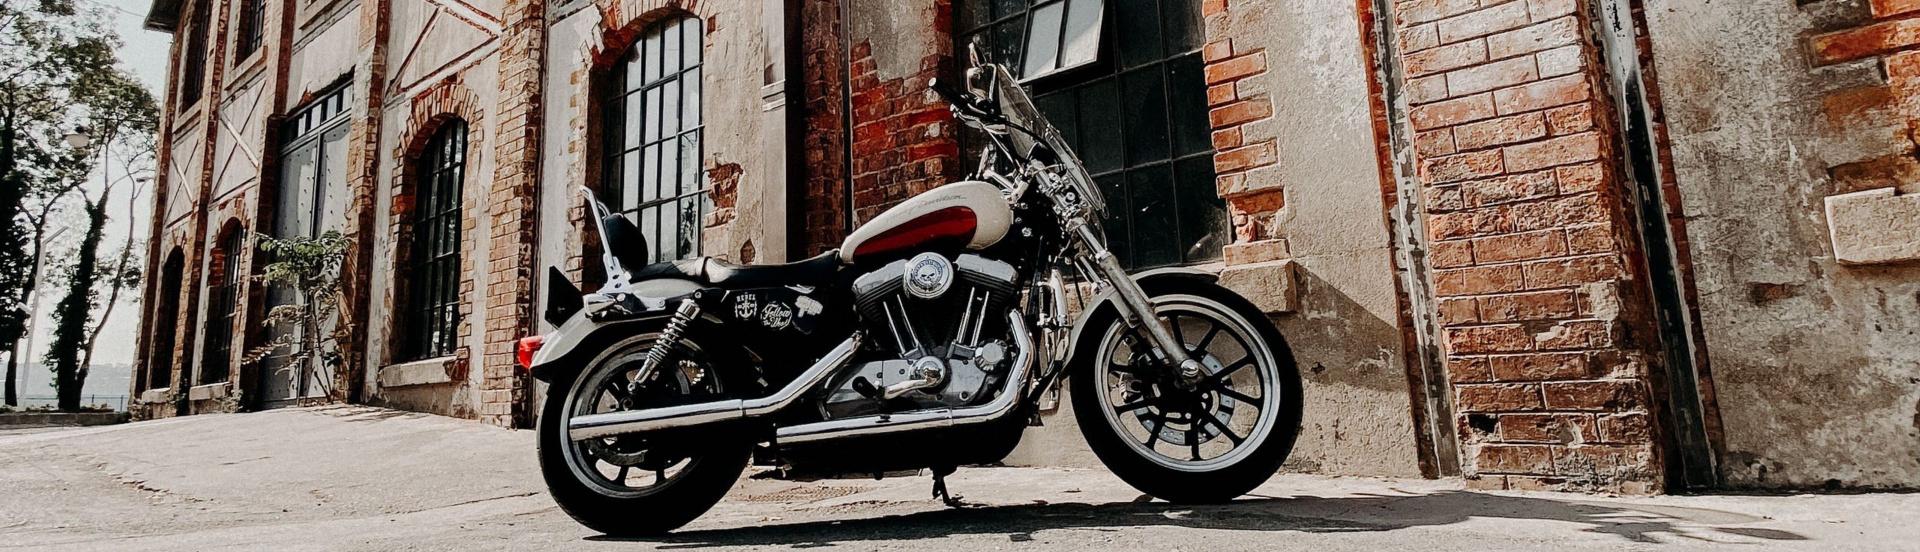 Мотоциклы в лизинг